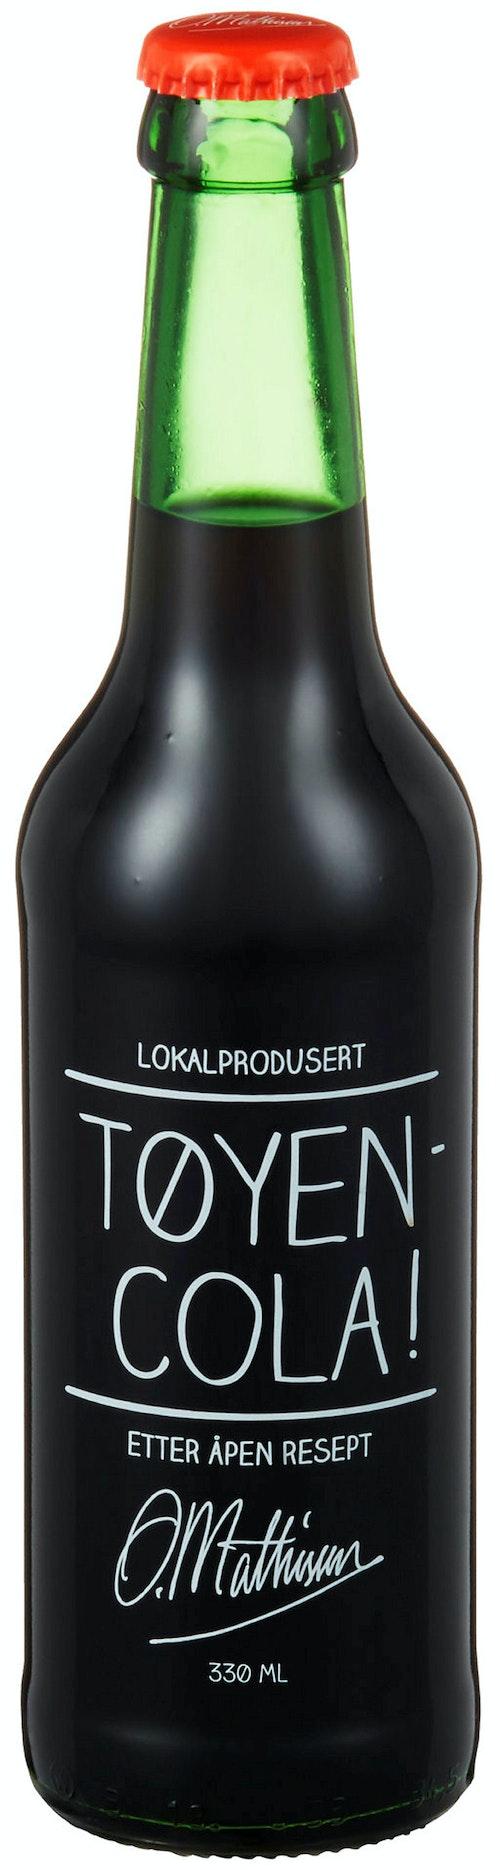 Tøyen-Cola 0,33 l